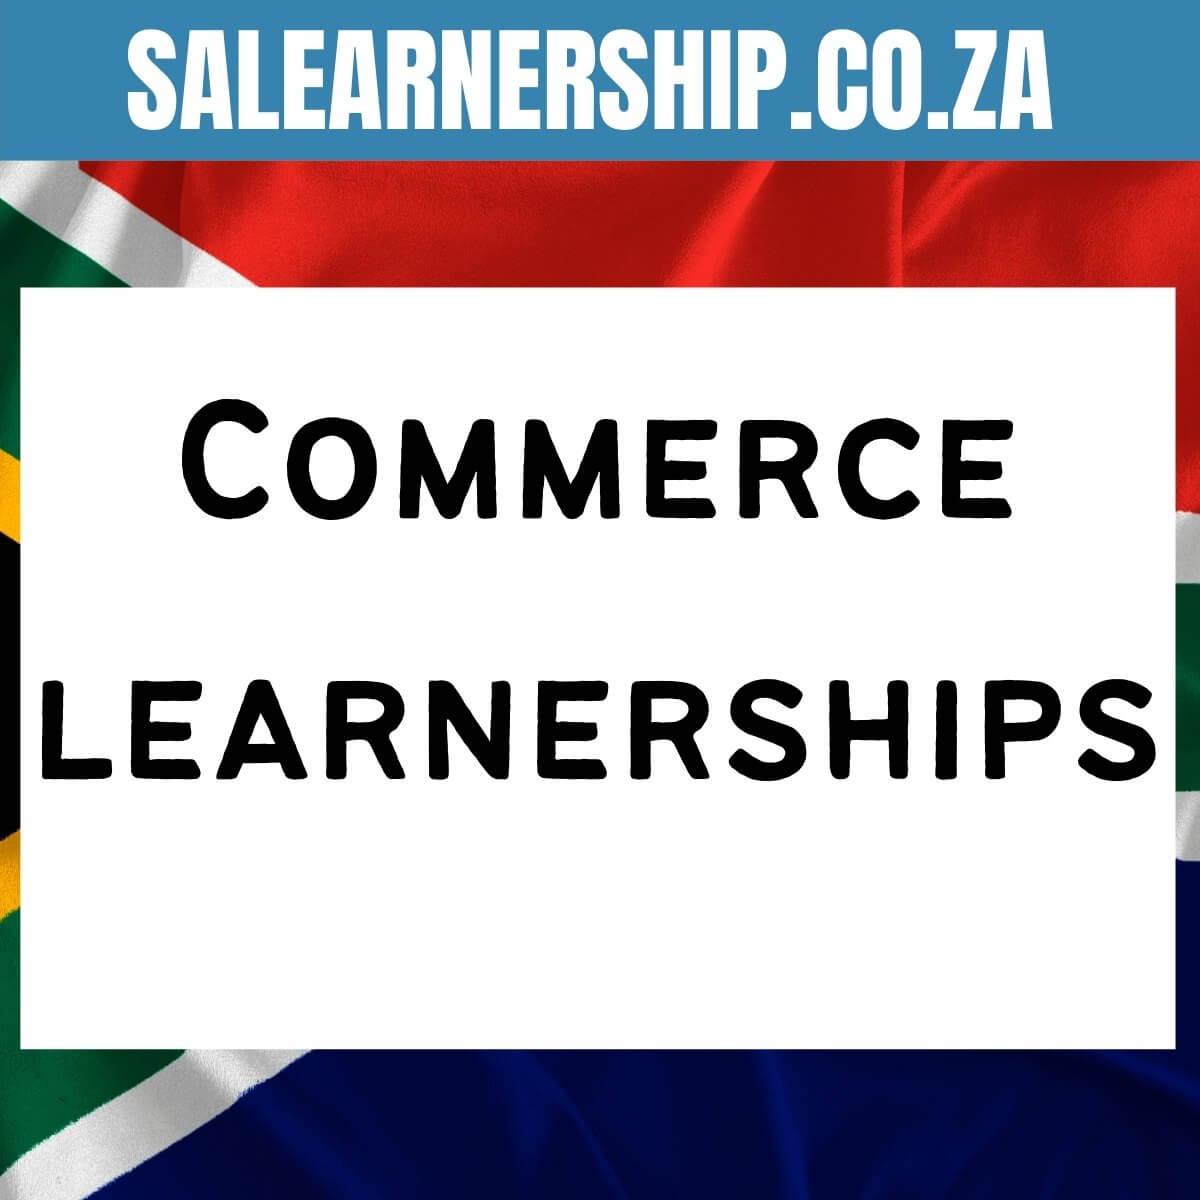 Commerce learnerships